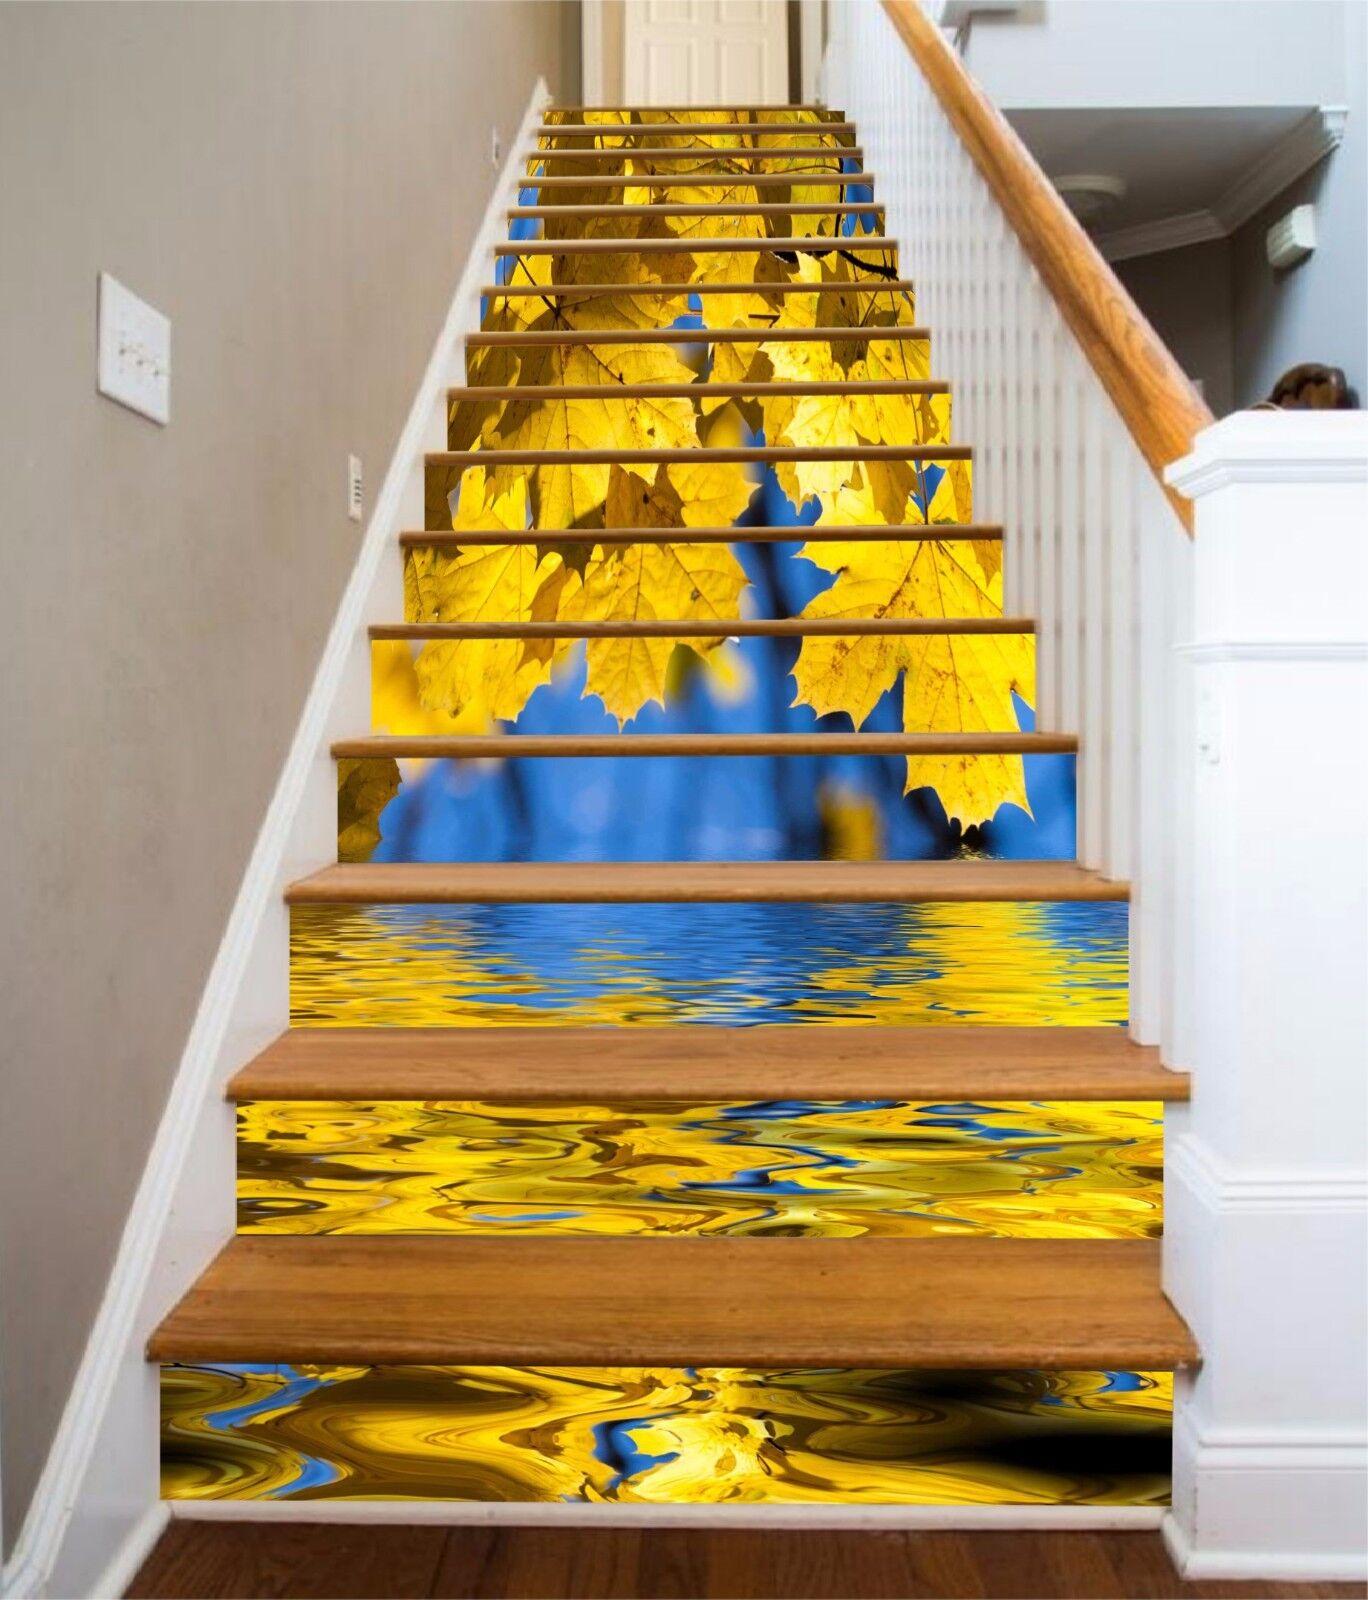 3D Gelb leaves 7 Stair Risers Decoration Photo Mural Vinyl Decal Wallpaper UK